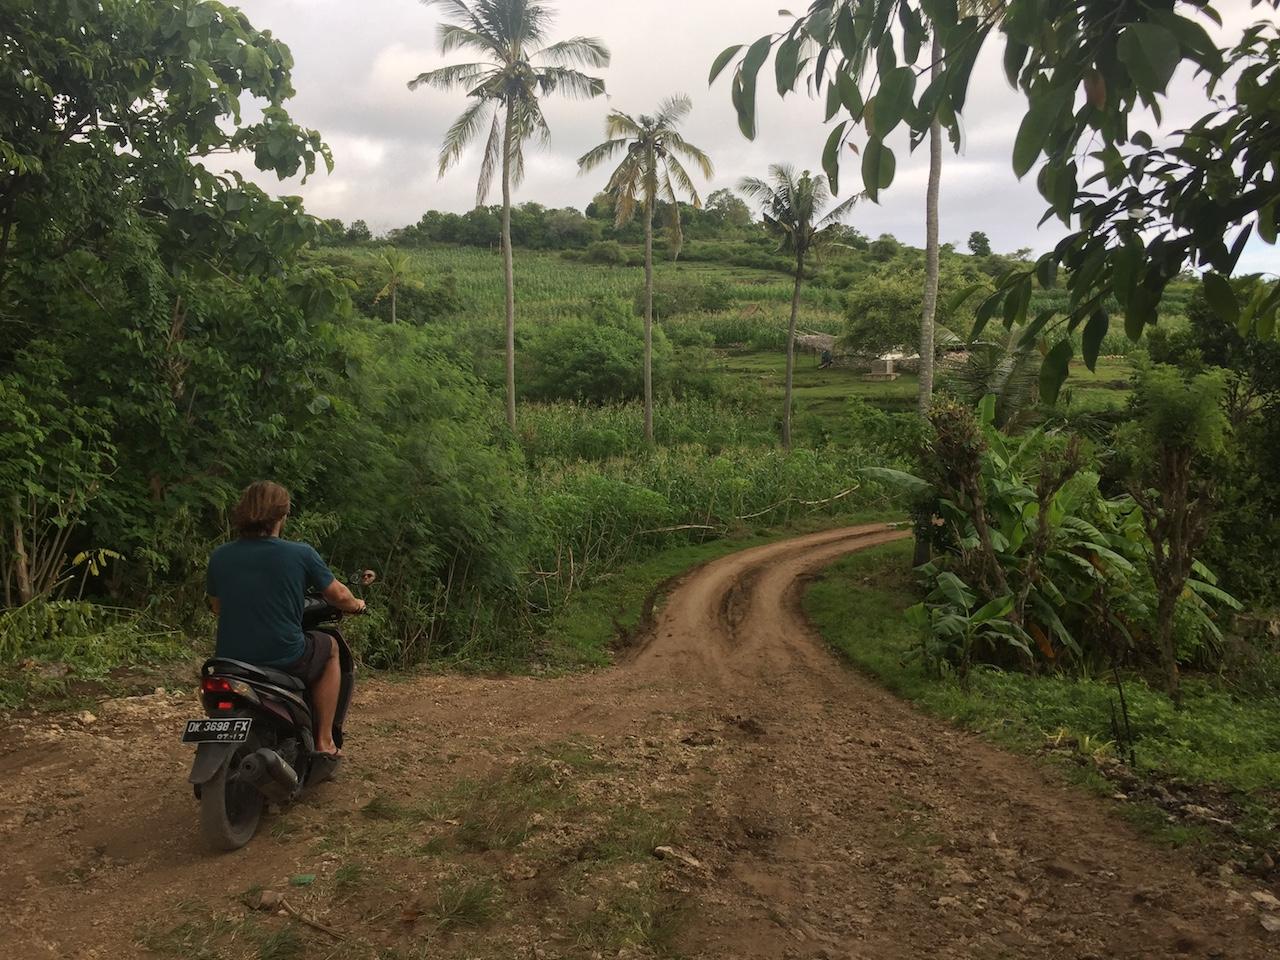 roller-fahren-indonesien-5